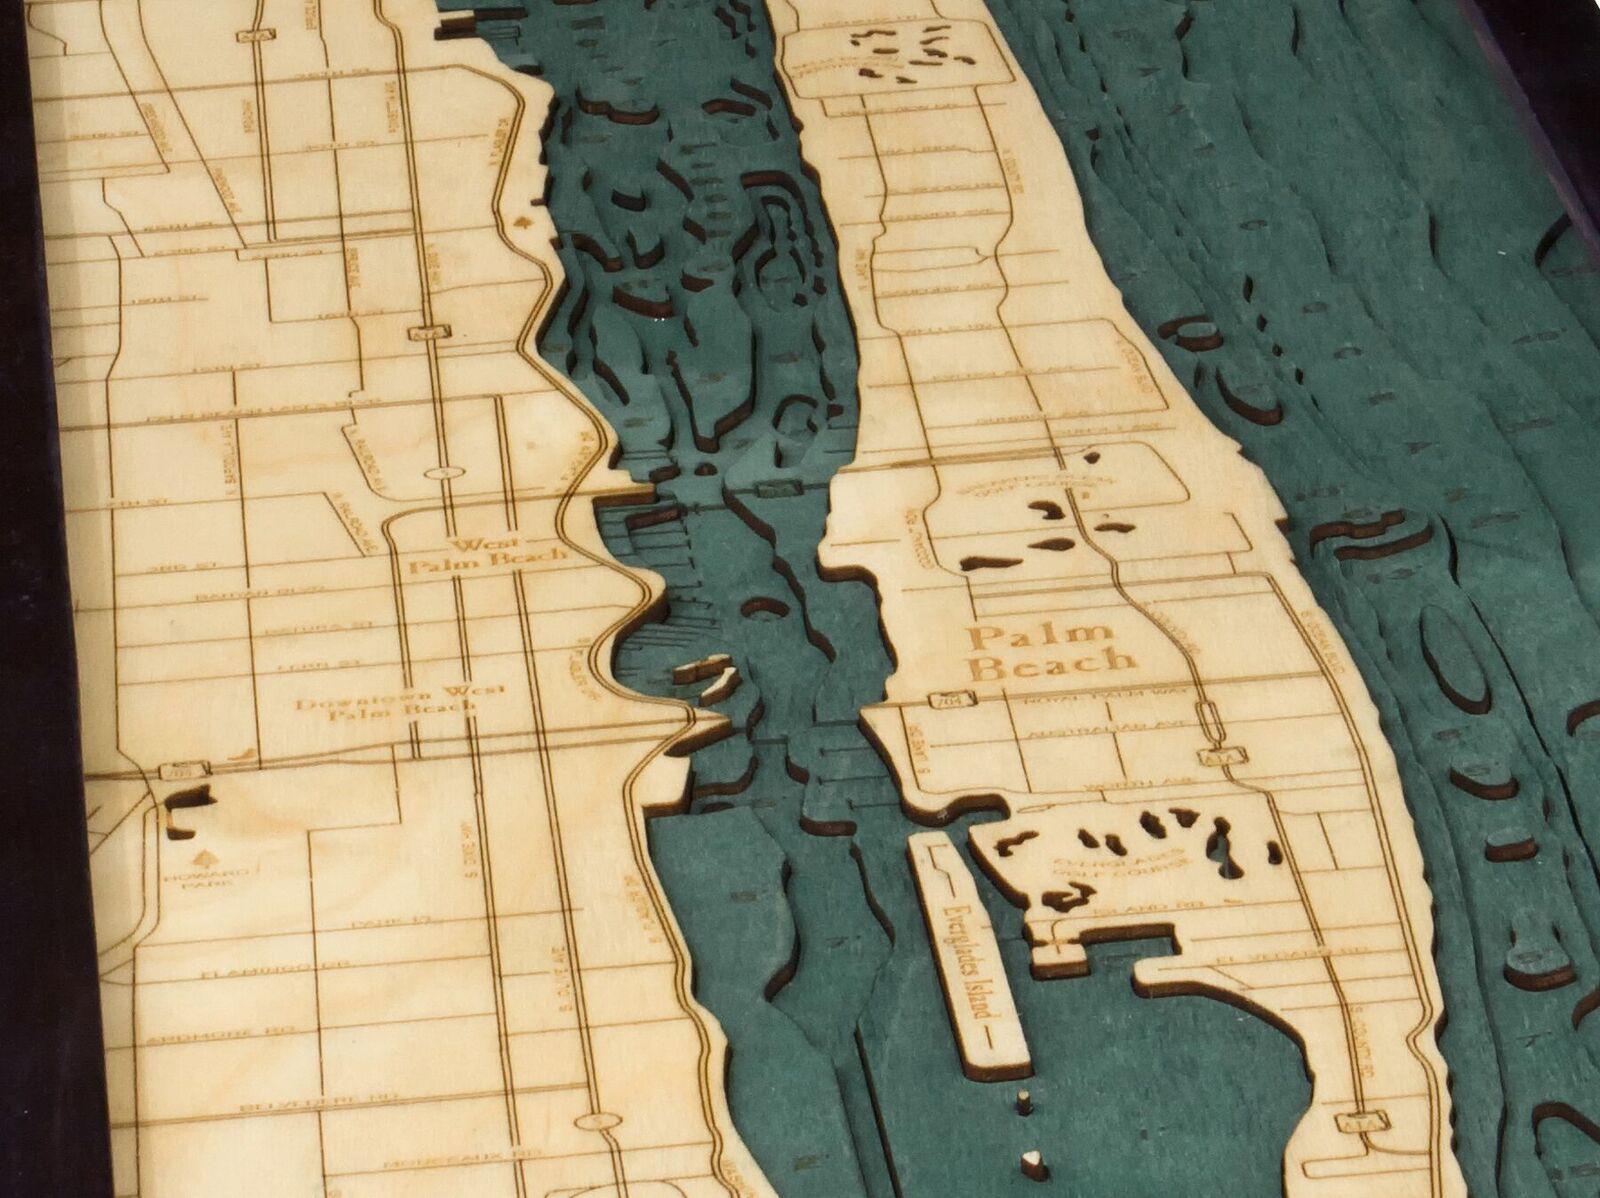 Map Of Palm Beach Florida.Bathymetric Map Palm Beach Florida Scrimshaw Gallery